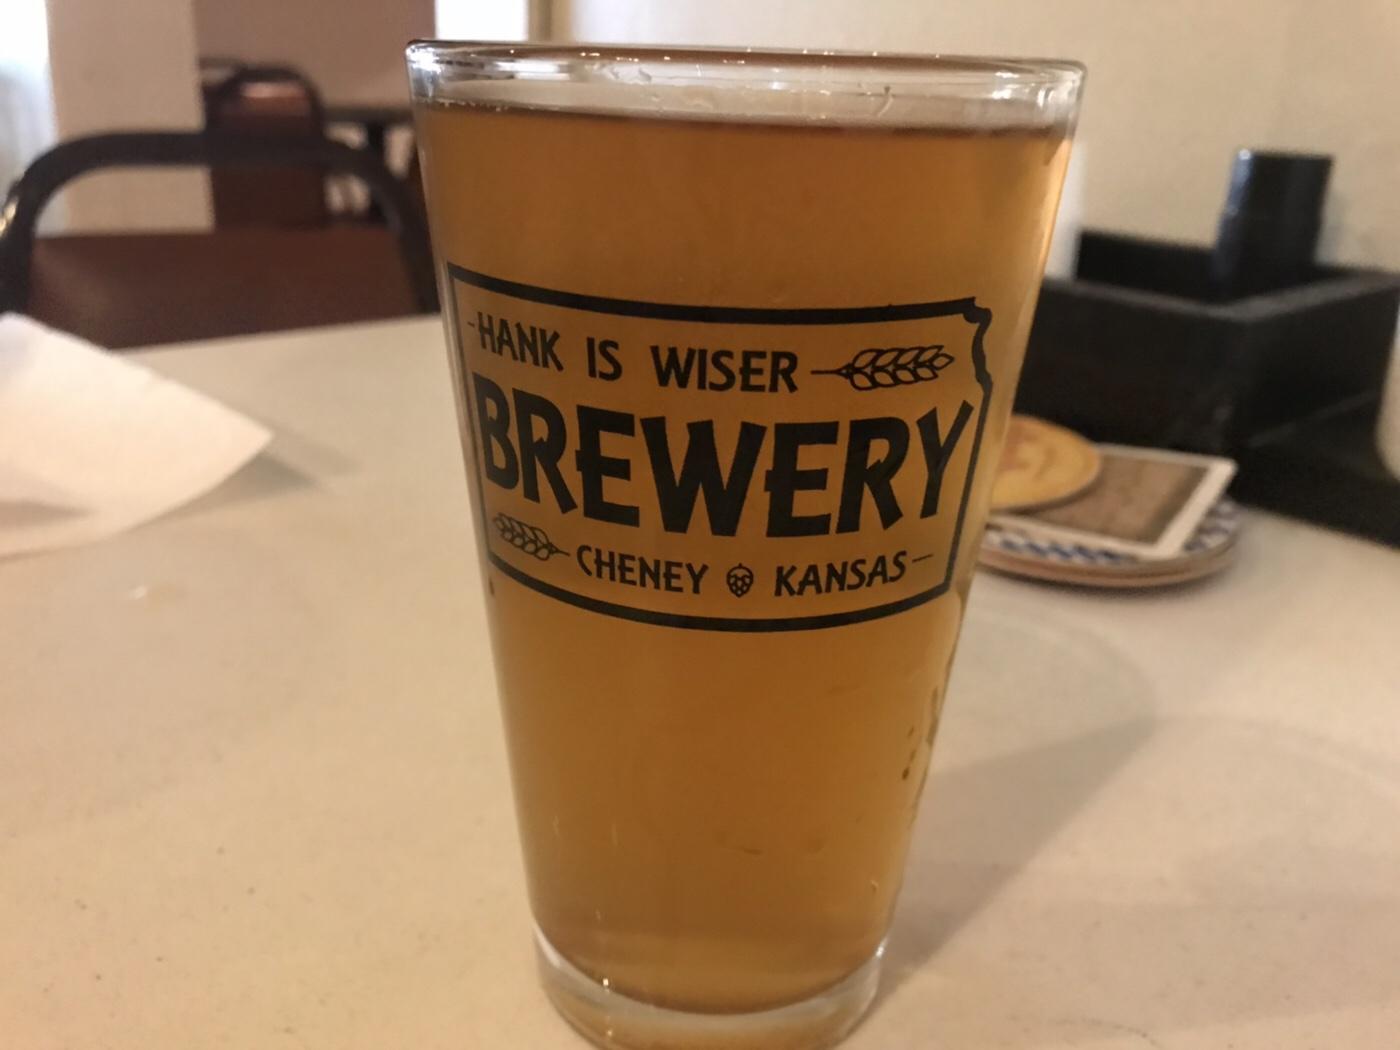 Hank Is Wiser Brewery